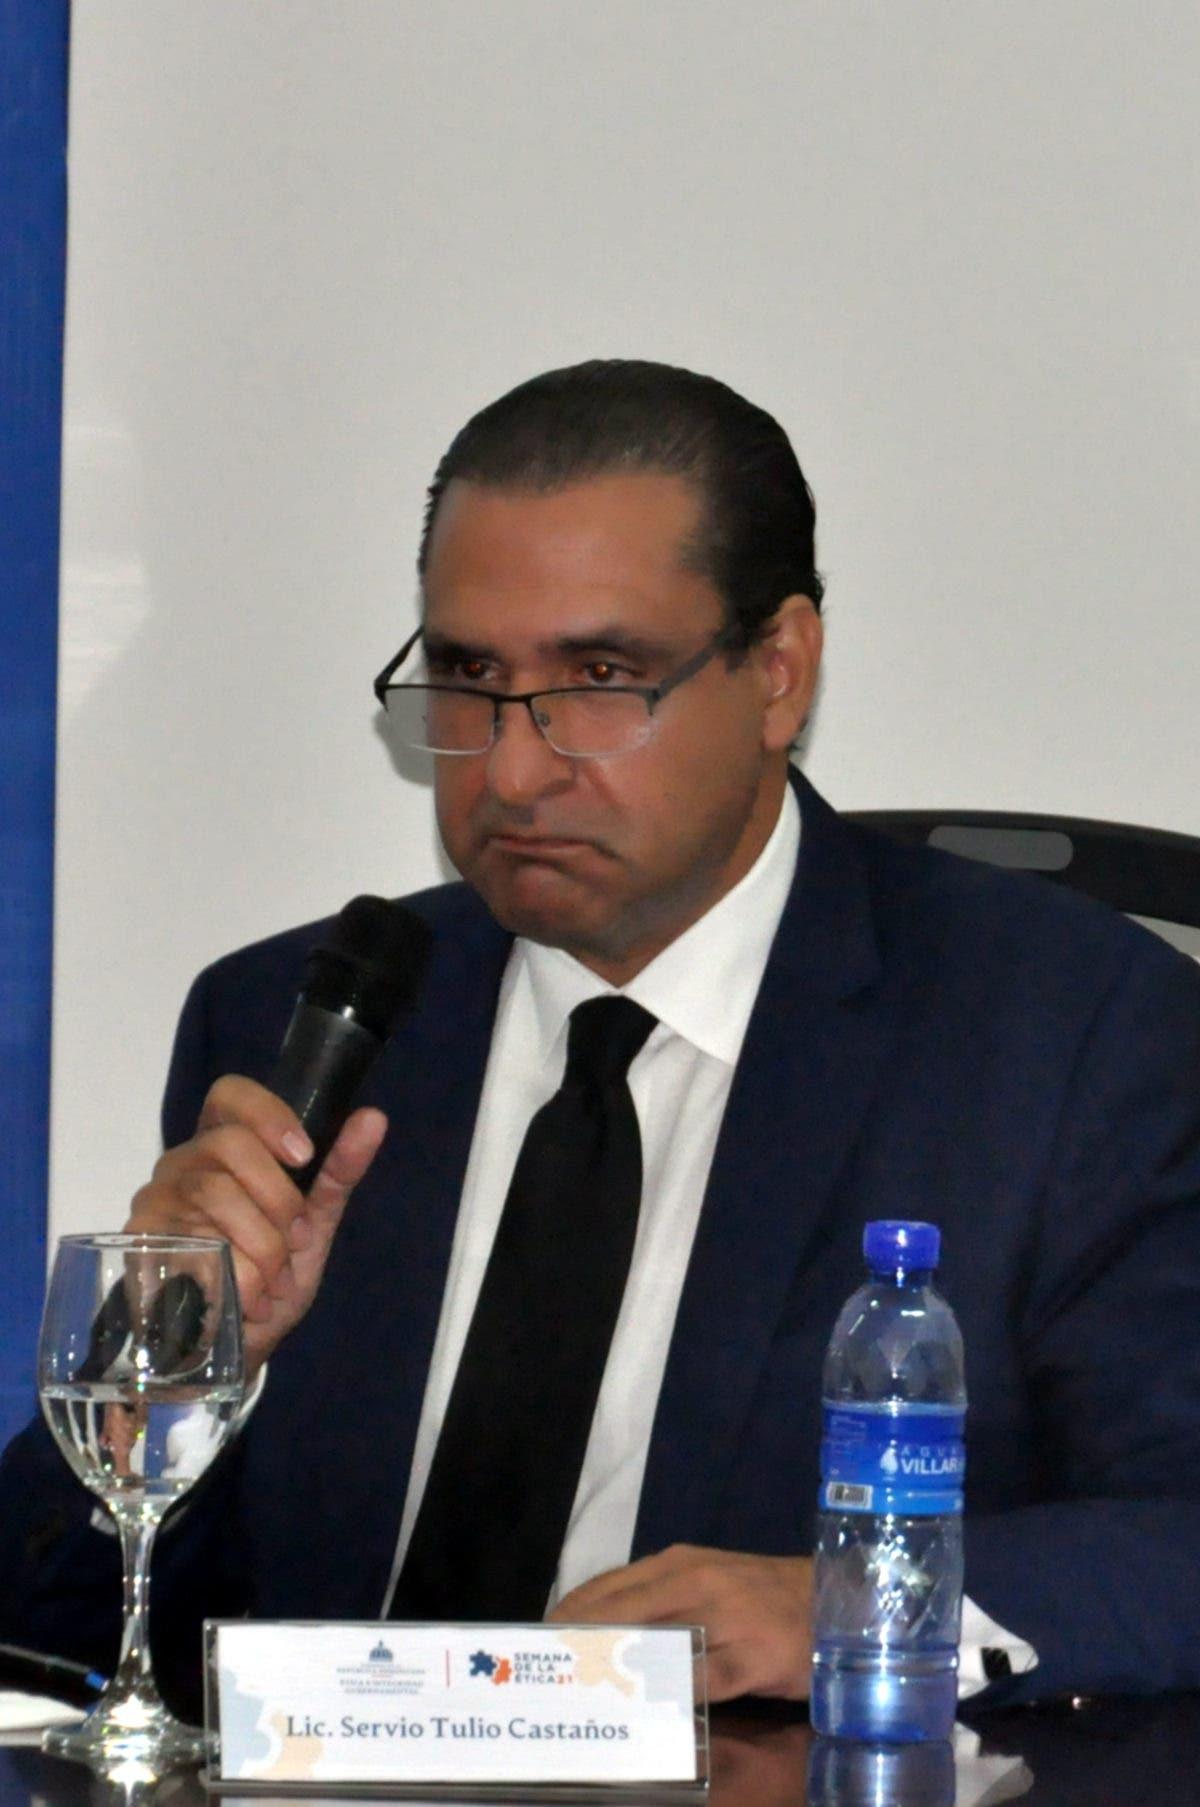 Castaños Guzmán rechaza Código Penal contemple prisión de dos a tres años para actos de corrupción